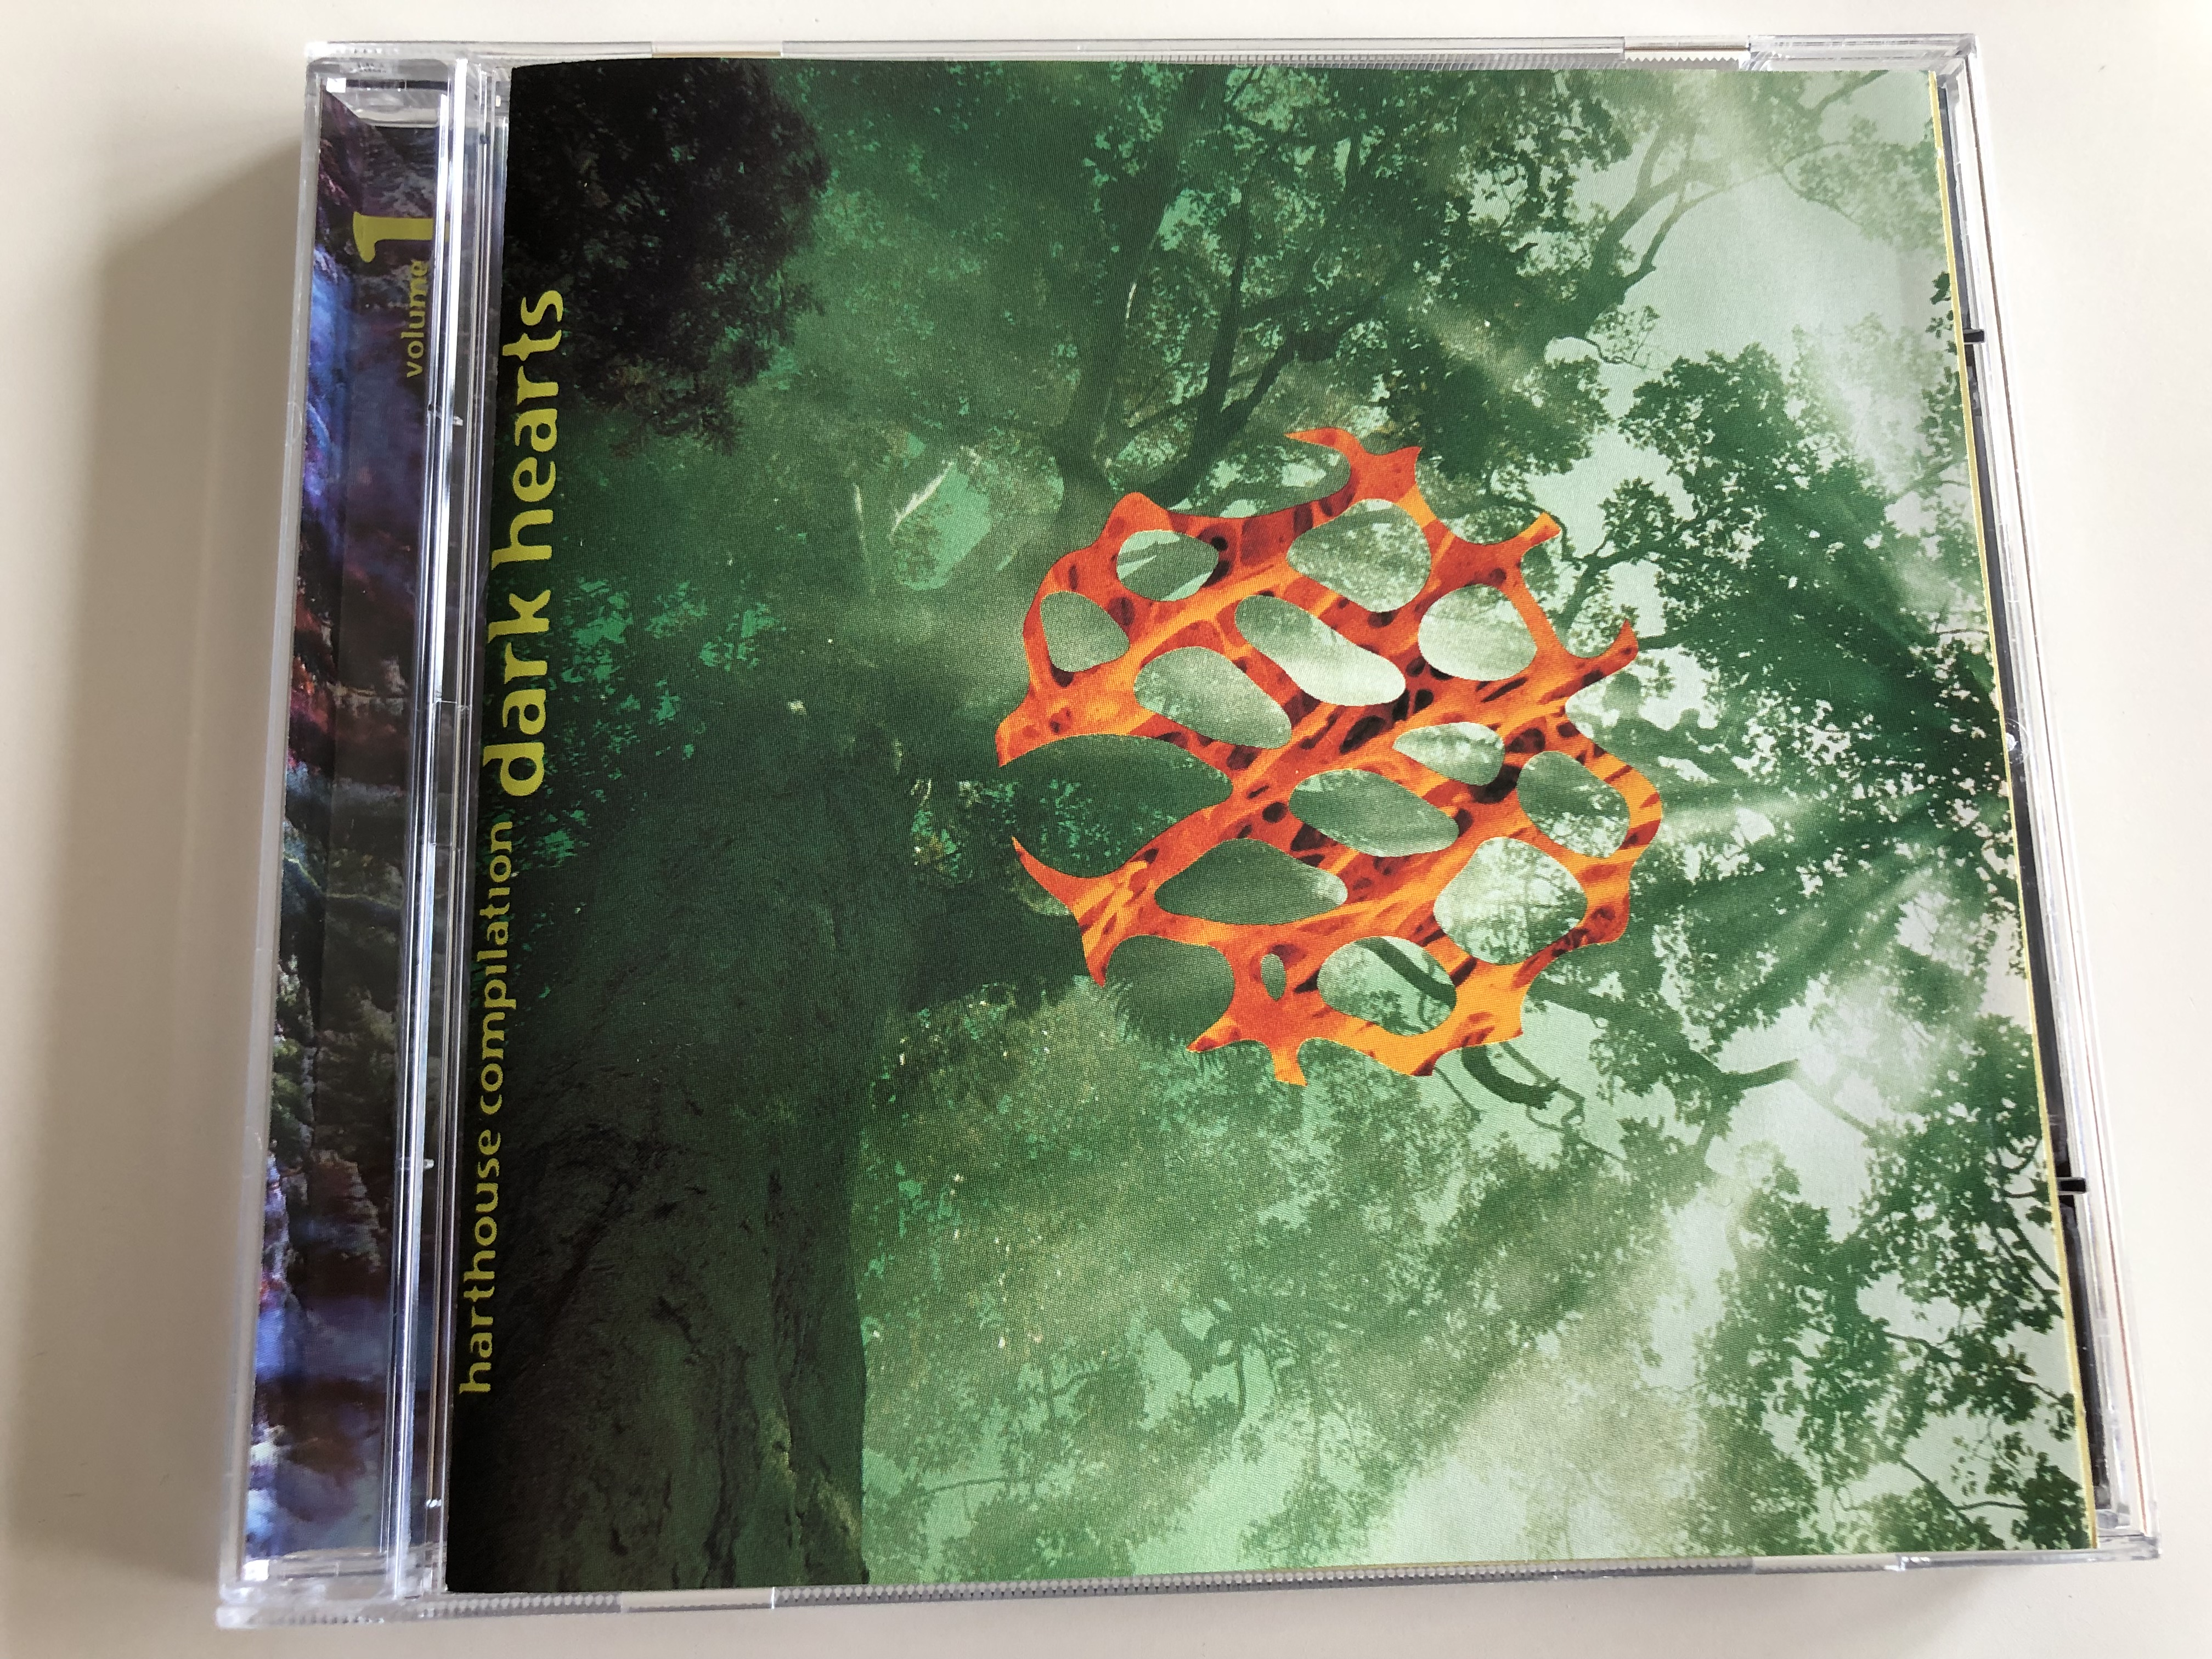 dark-hearts-vol.-1-harthouse-compilation-metal-master-the-ambush-barbarella-progressive-attack-spicelab-alter-ego-audio-cd-1995-hh-1004-2-1-.jpg